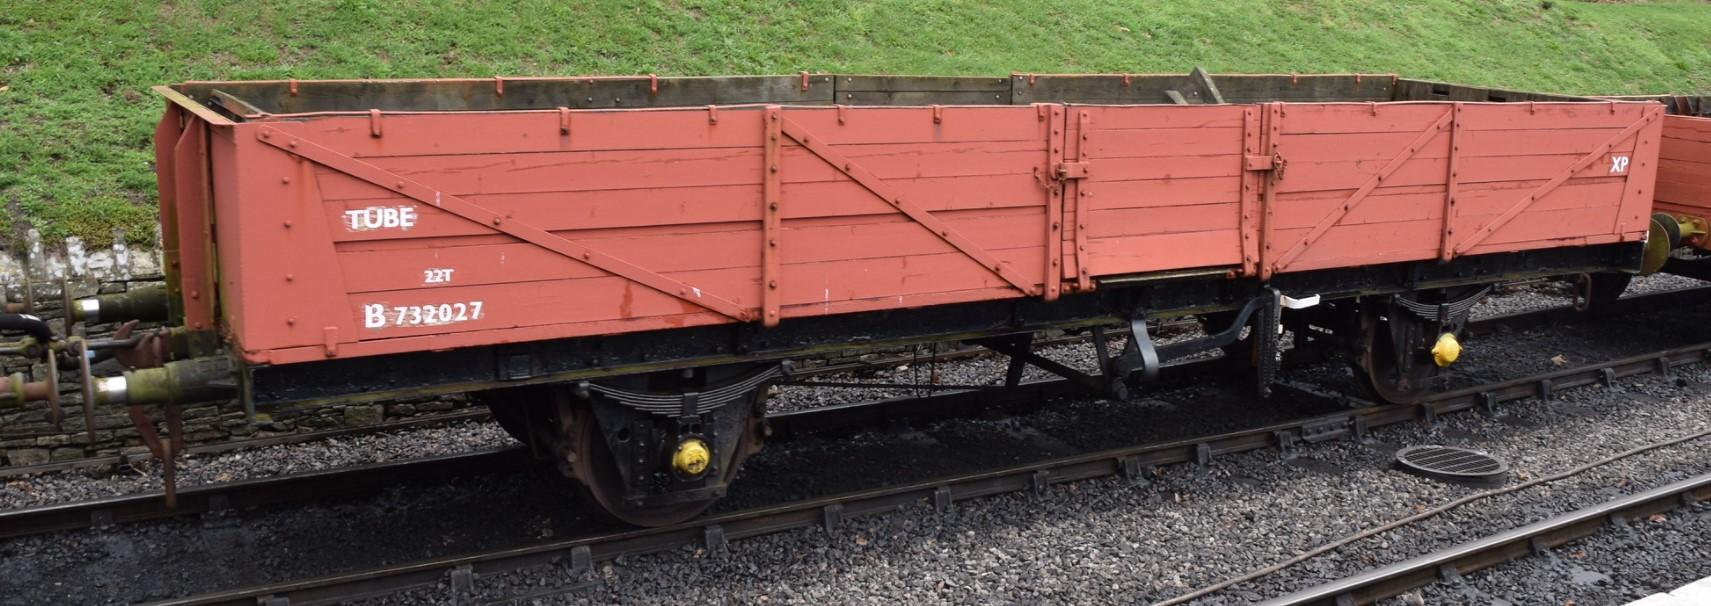 B732027 at Swanage in October 2019. ©Hugh Llewelyn